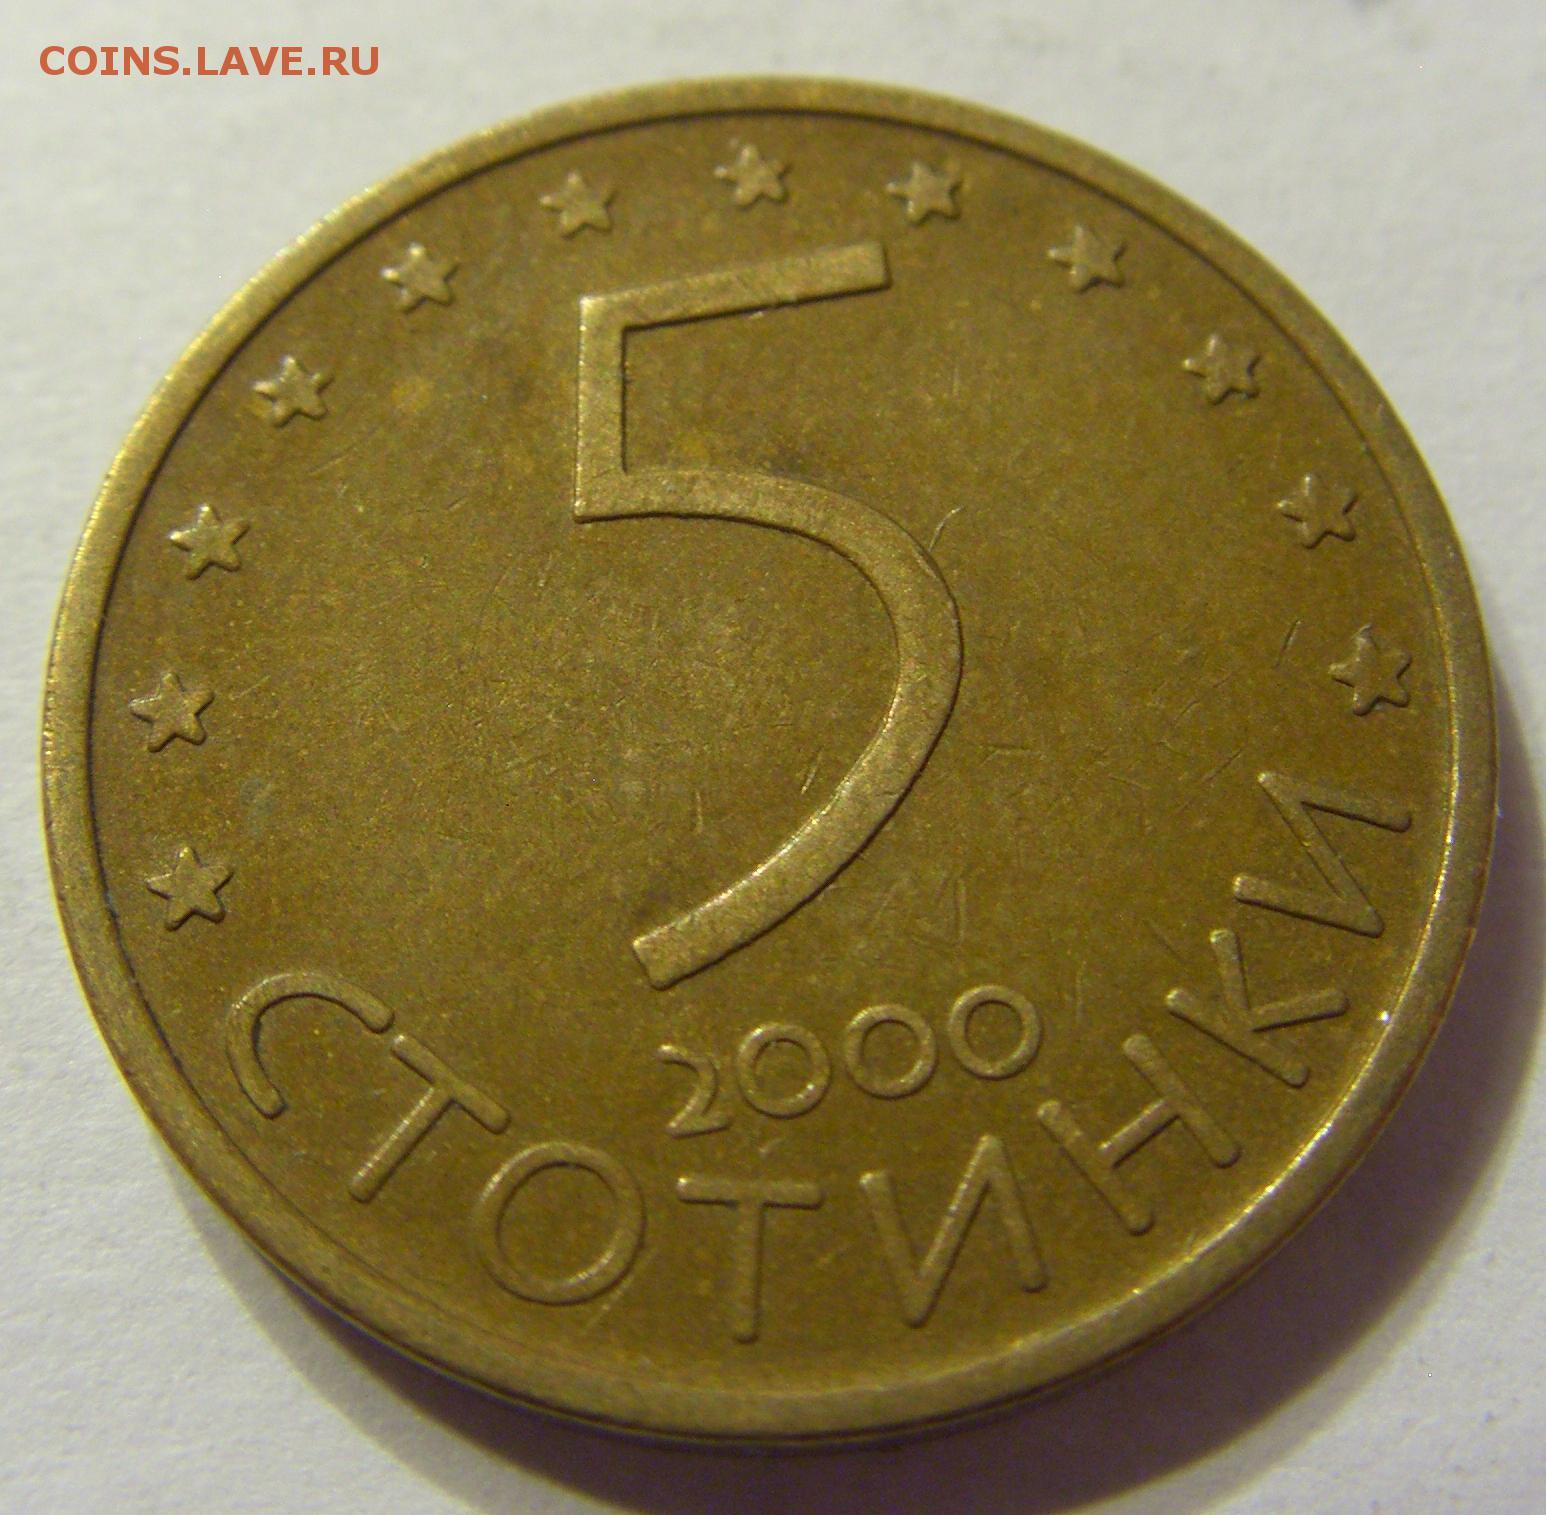 5 стотинок раскол 1993